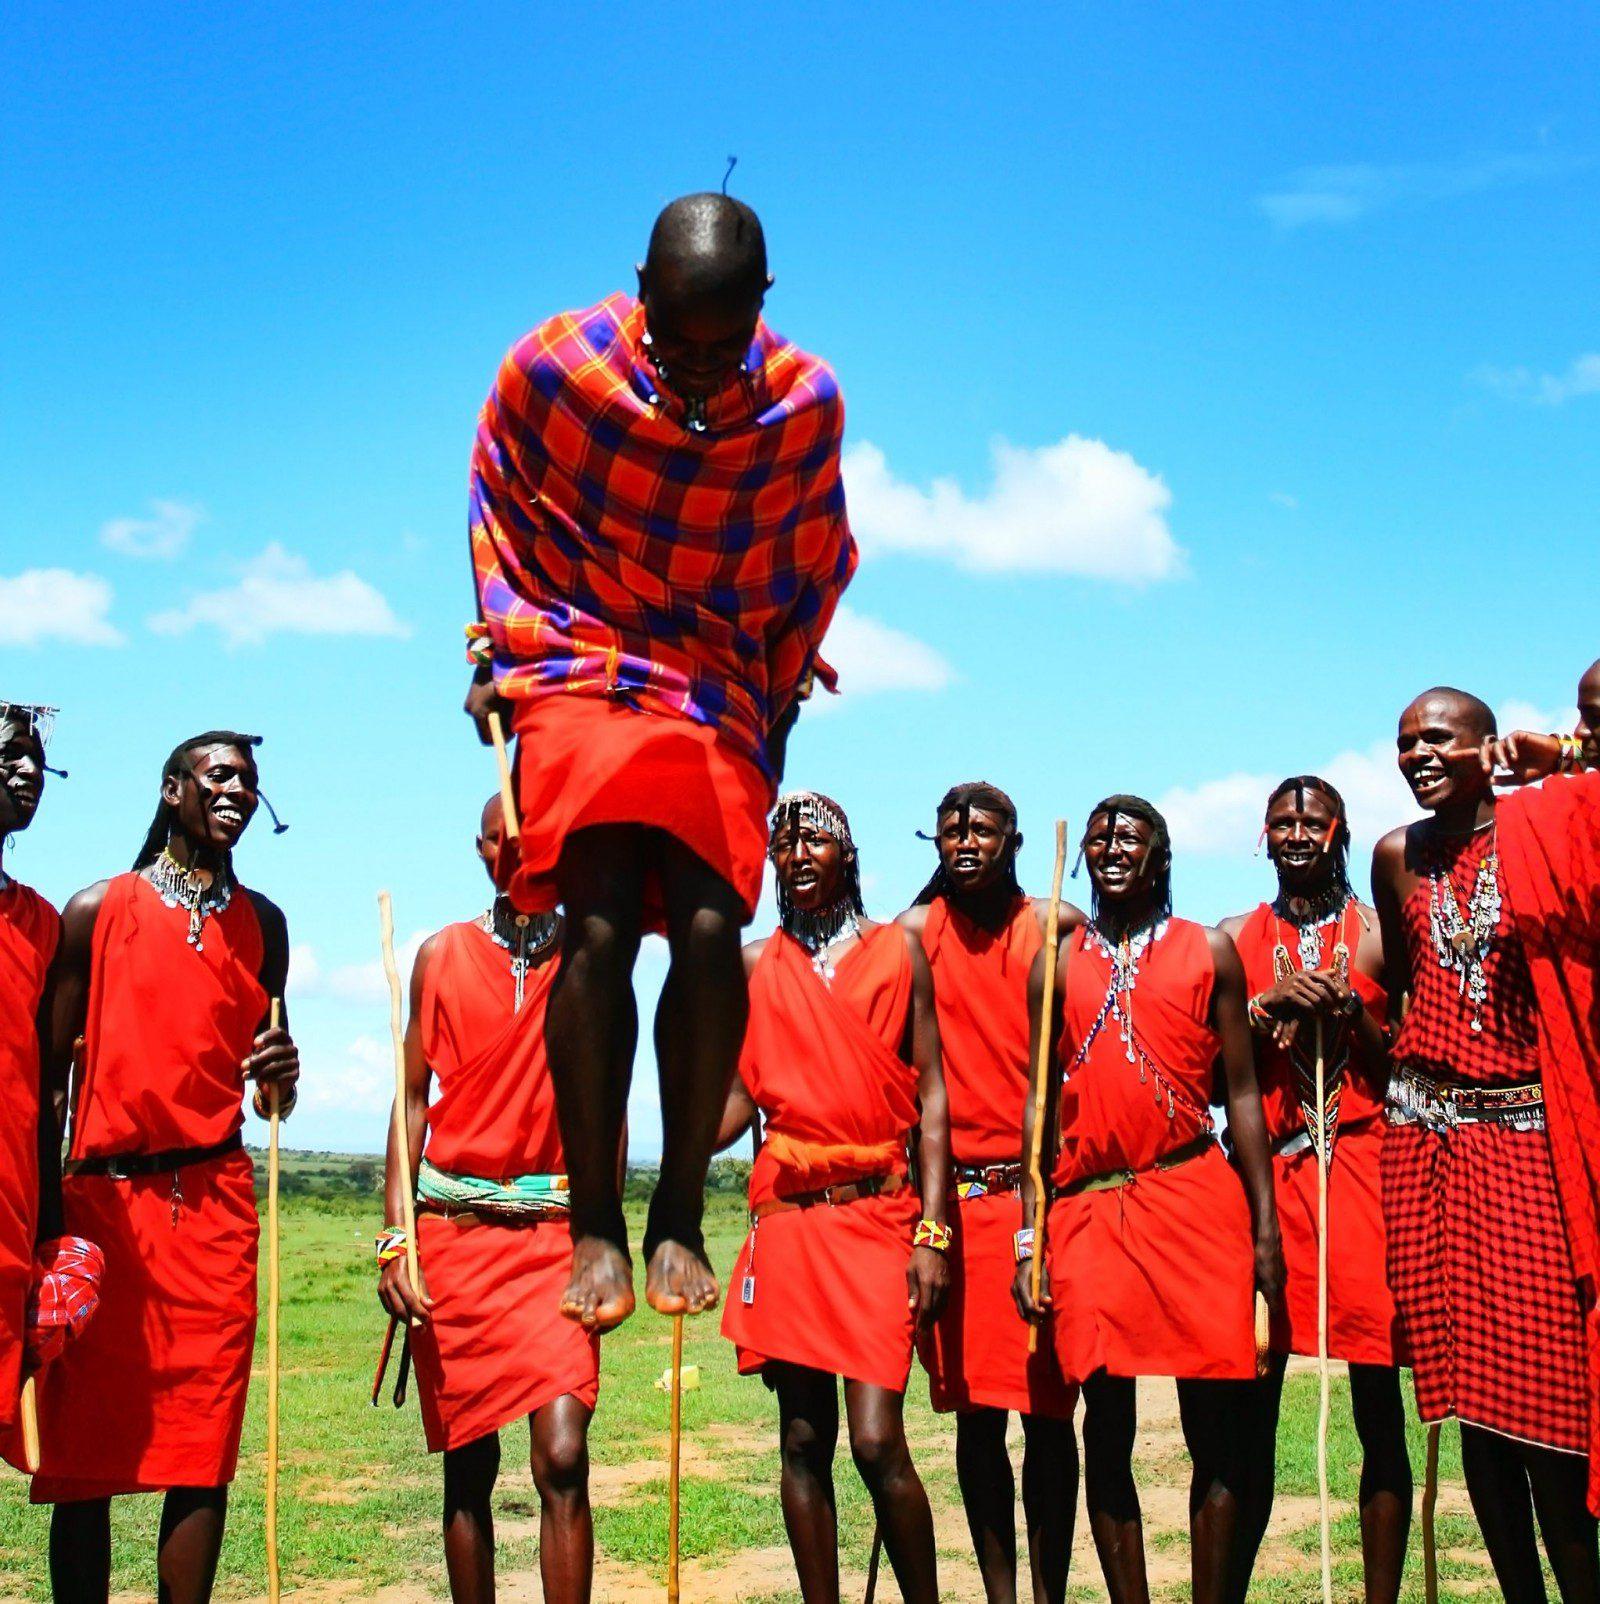 african-traditional-jumps-masai-mara-warriors-dancing-kenya-1600x1604